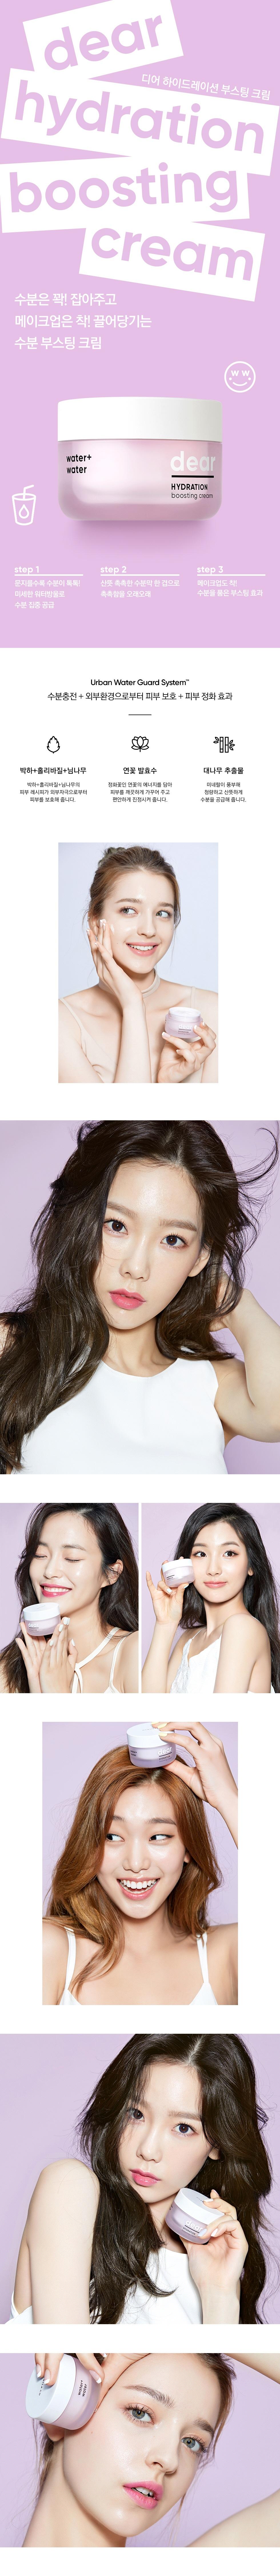 Banila Co Dear Hydration Boosting Cream korean cosmetic skincare product online shop malaysia macau singapore1